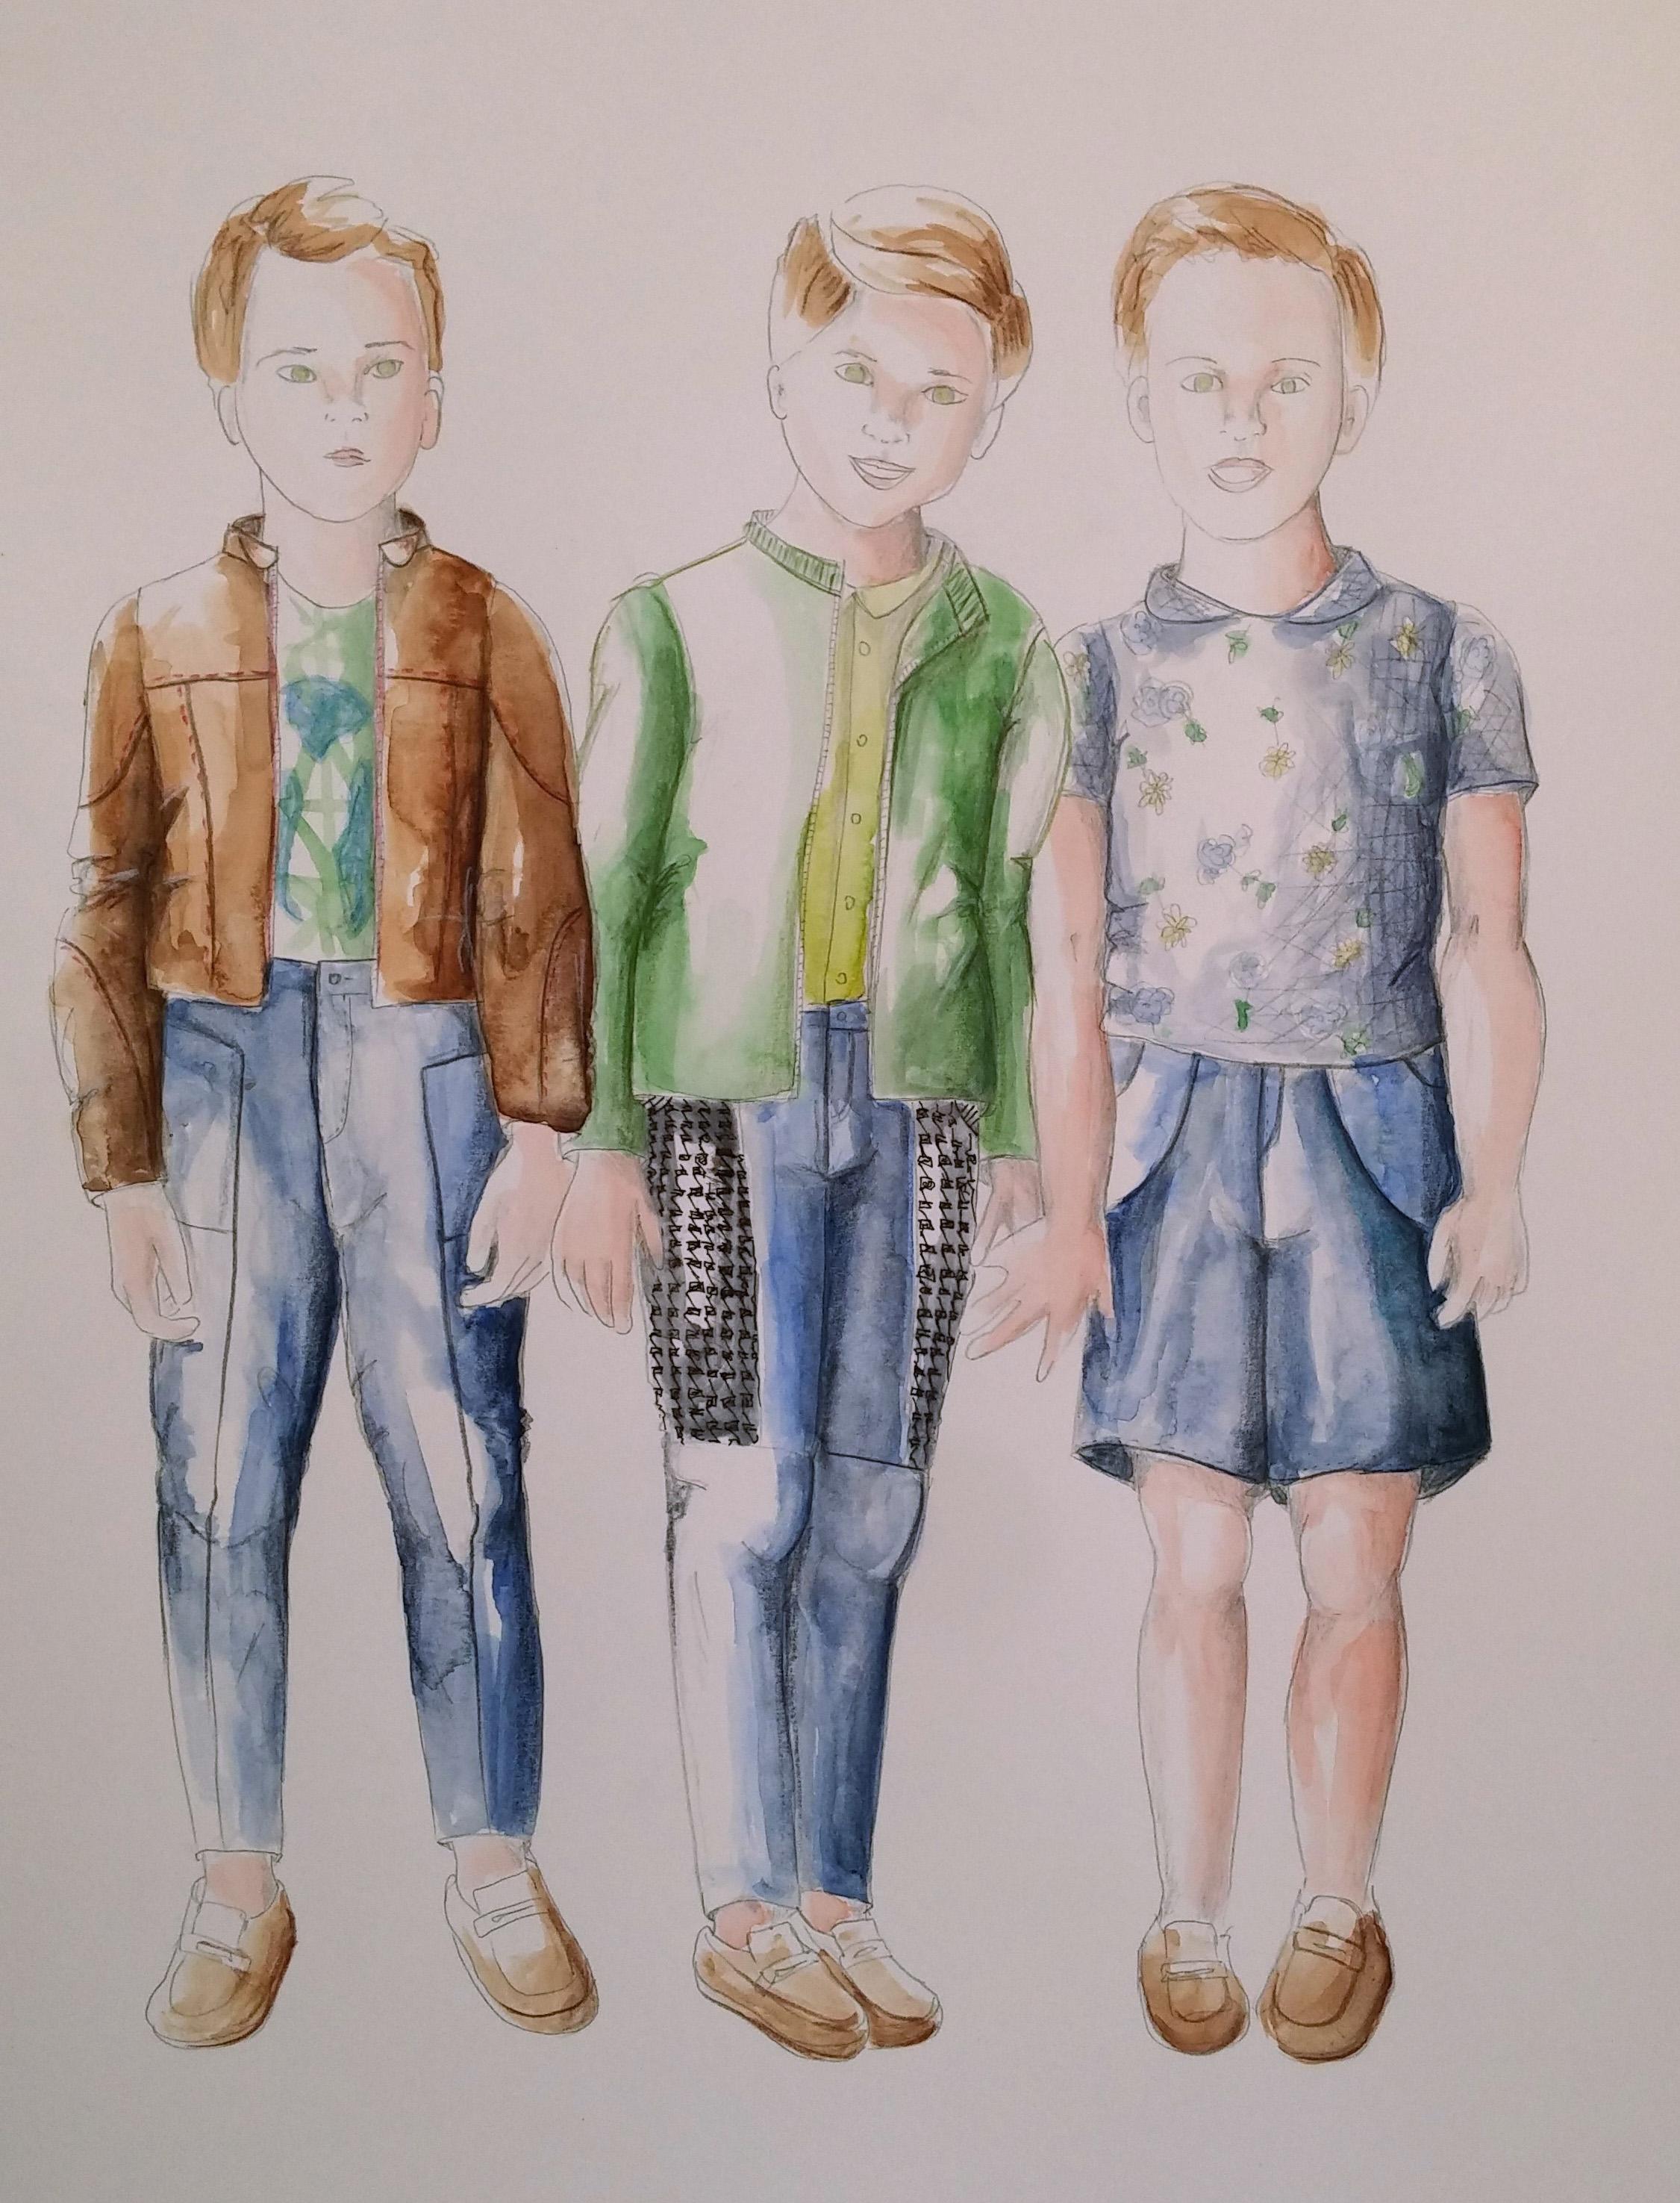 Fashion illustrations - Boys